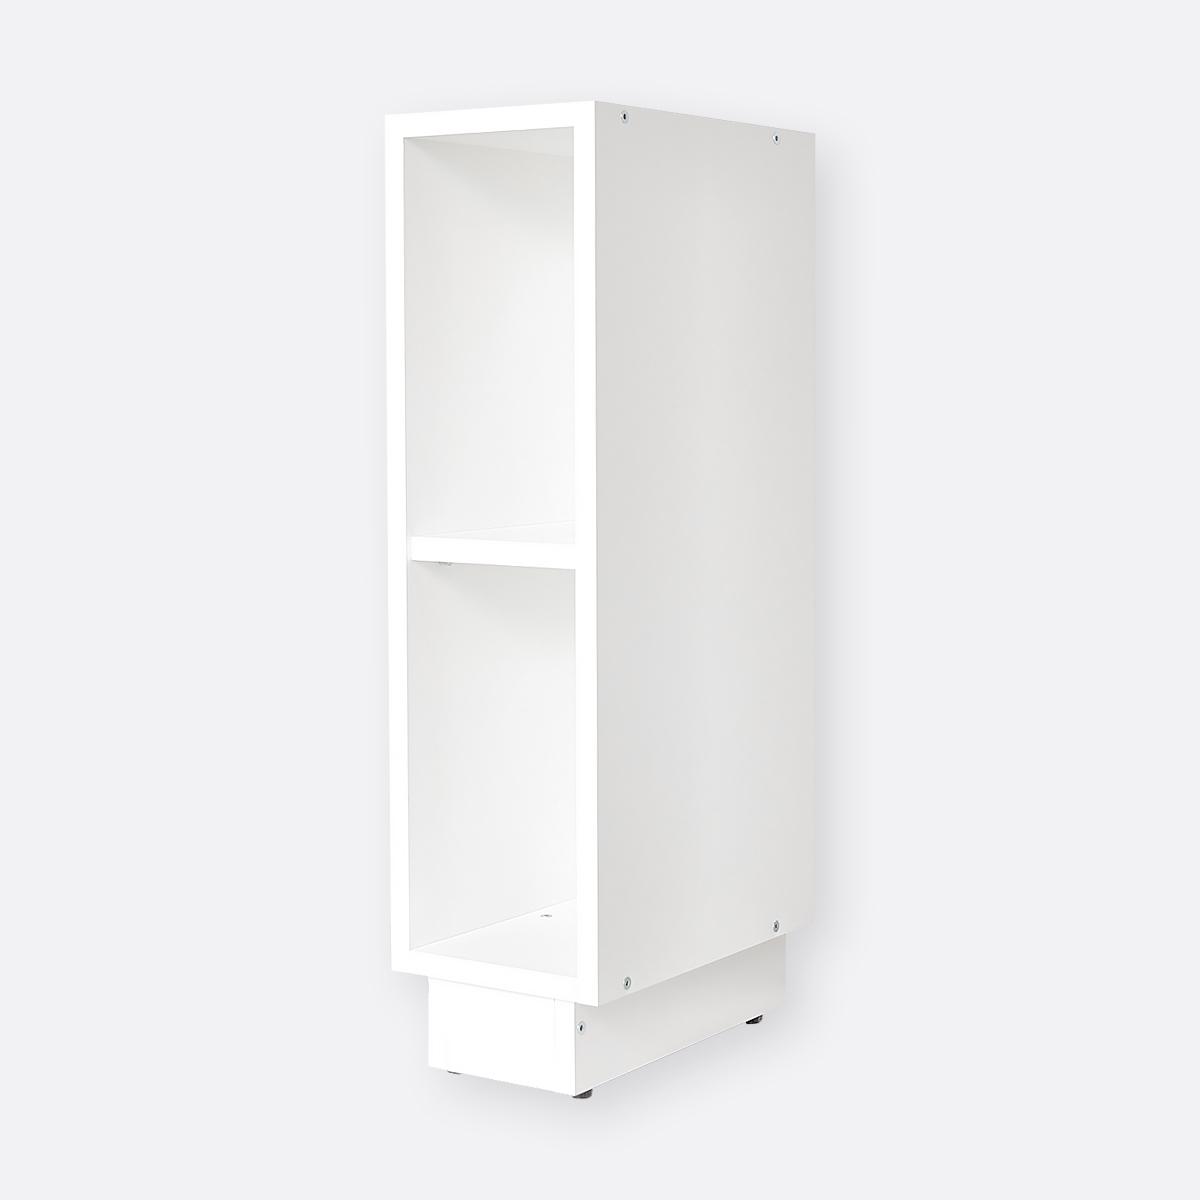 kraftkids stauraumregal f r wickeltisch wei passend f r malm kommode. Black Bedroom Furniture Sets. Home Design Ideas